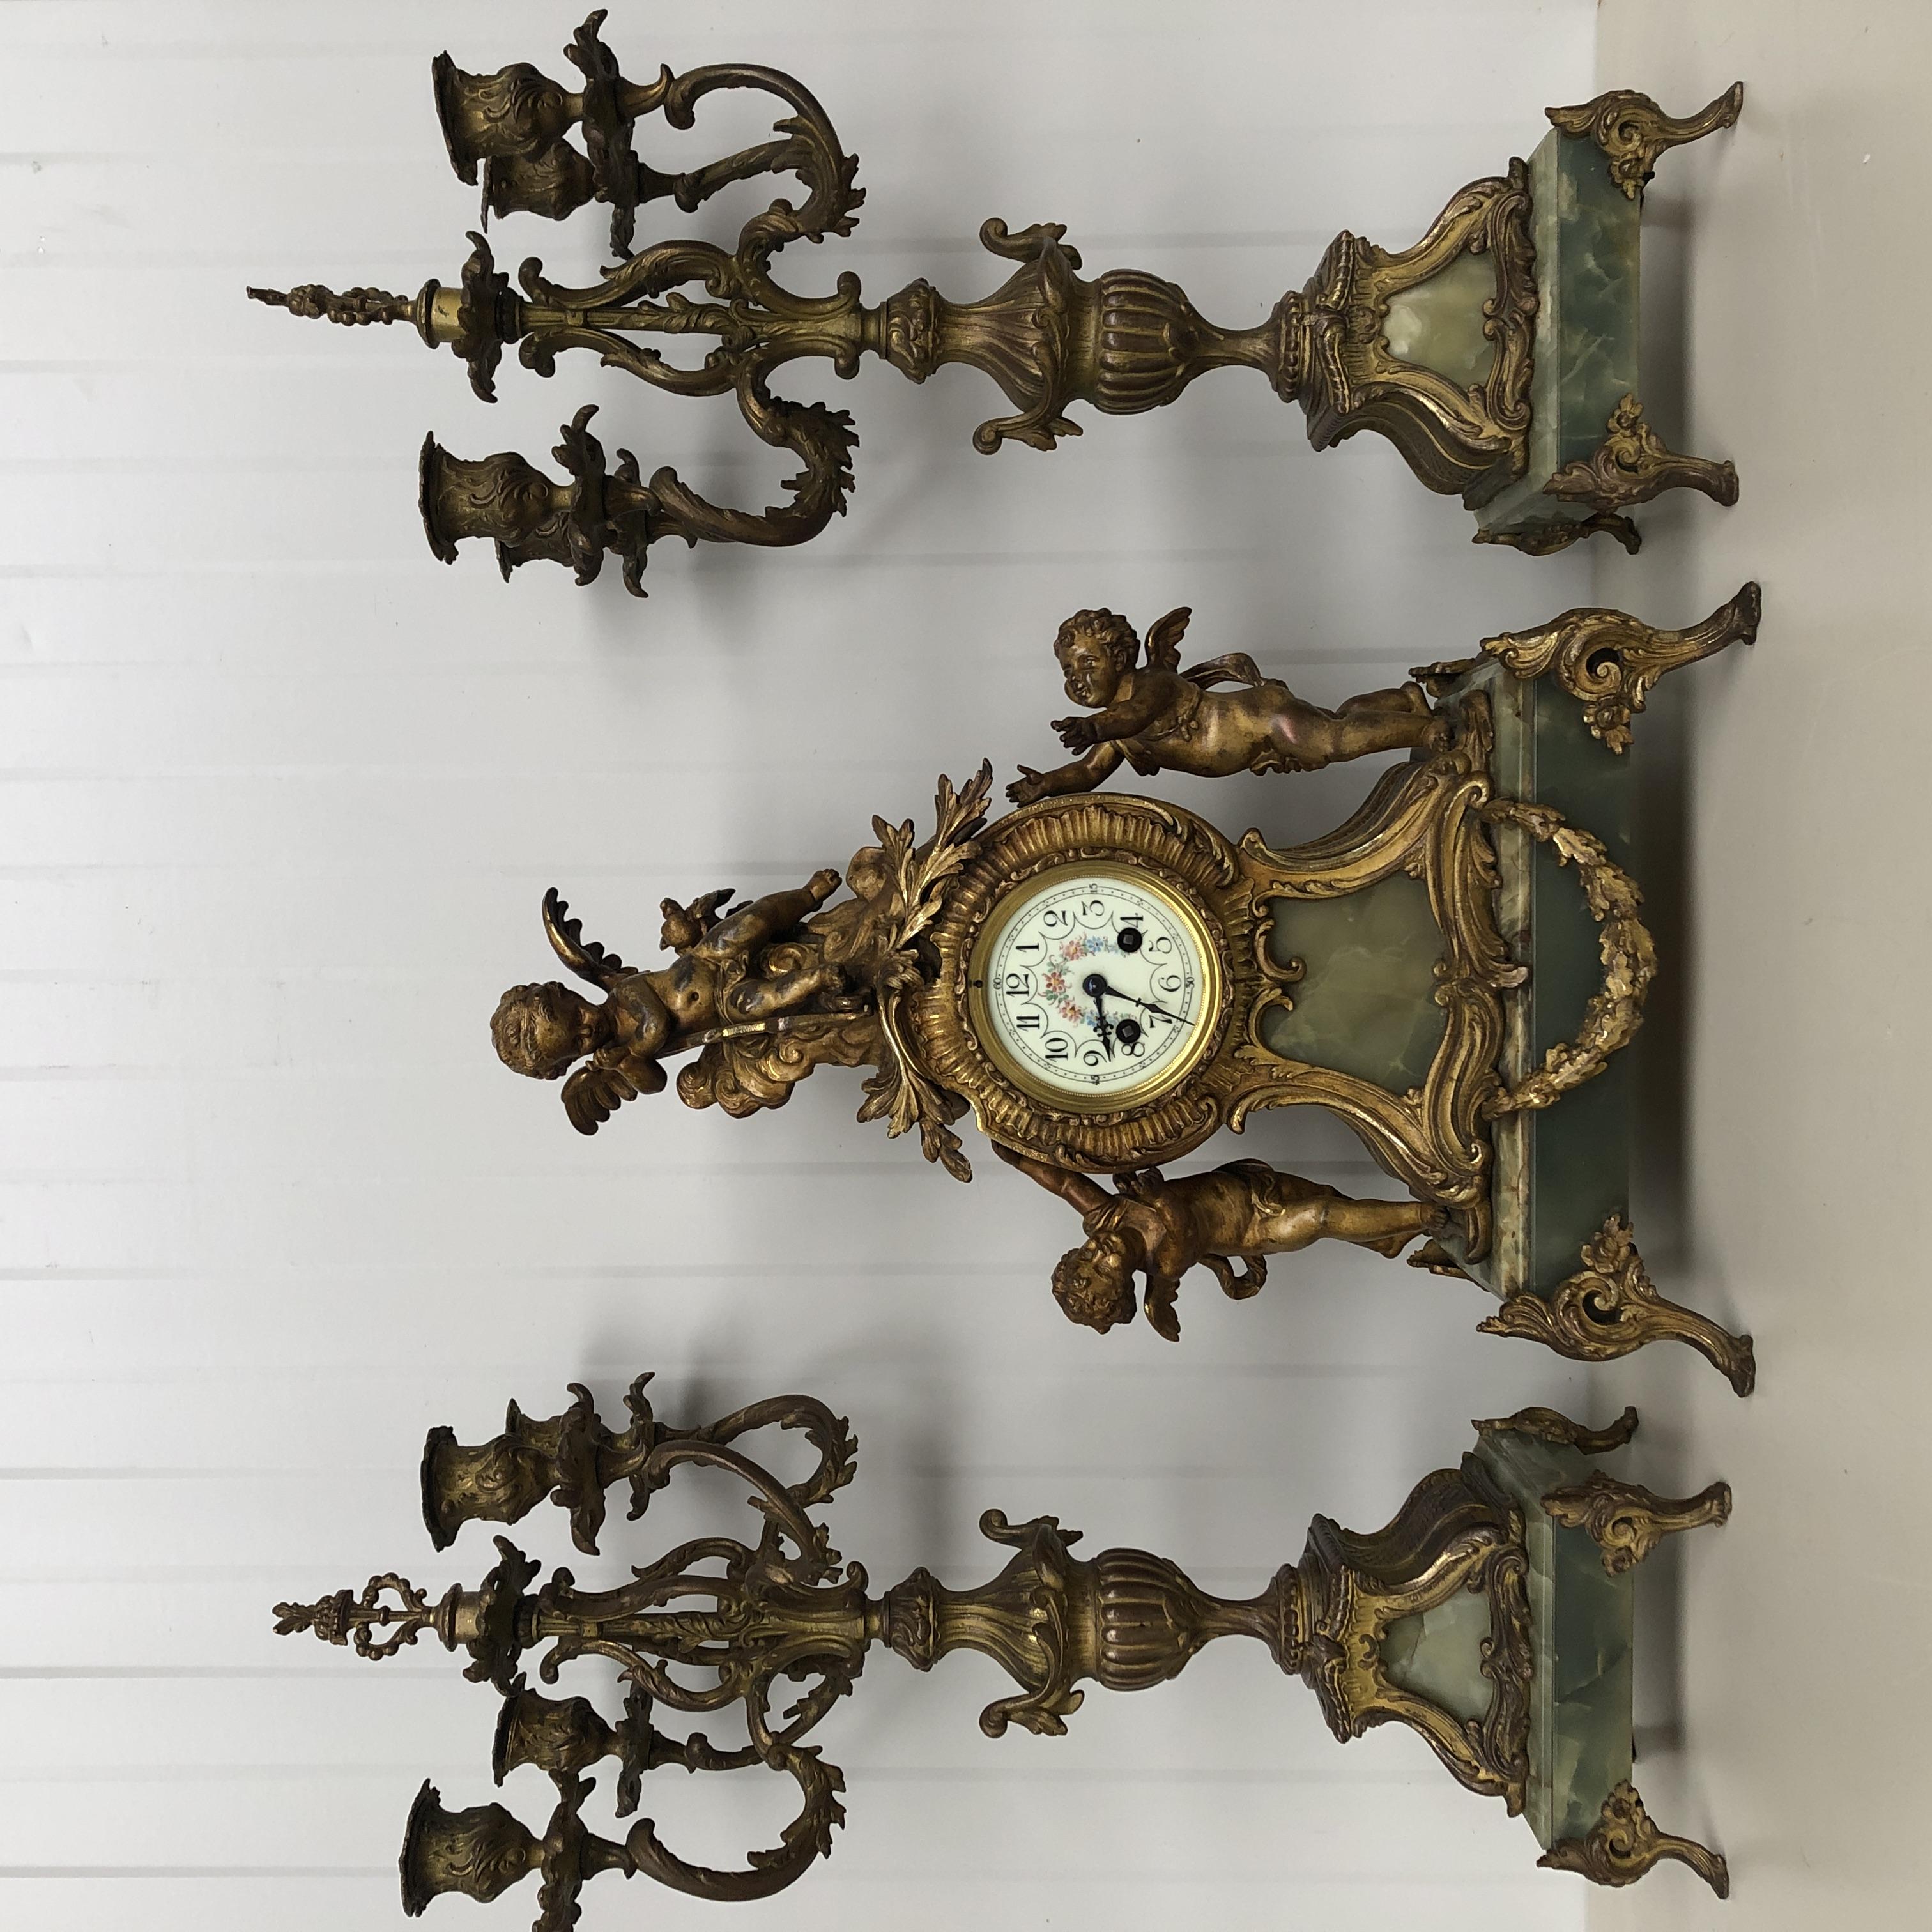 Marti & cie clock